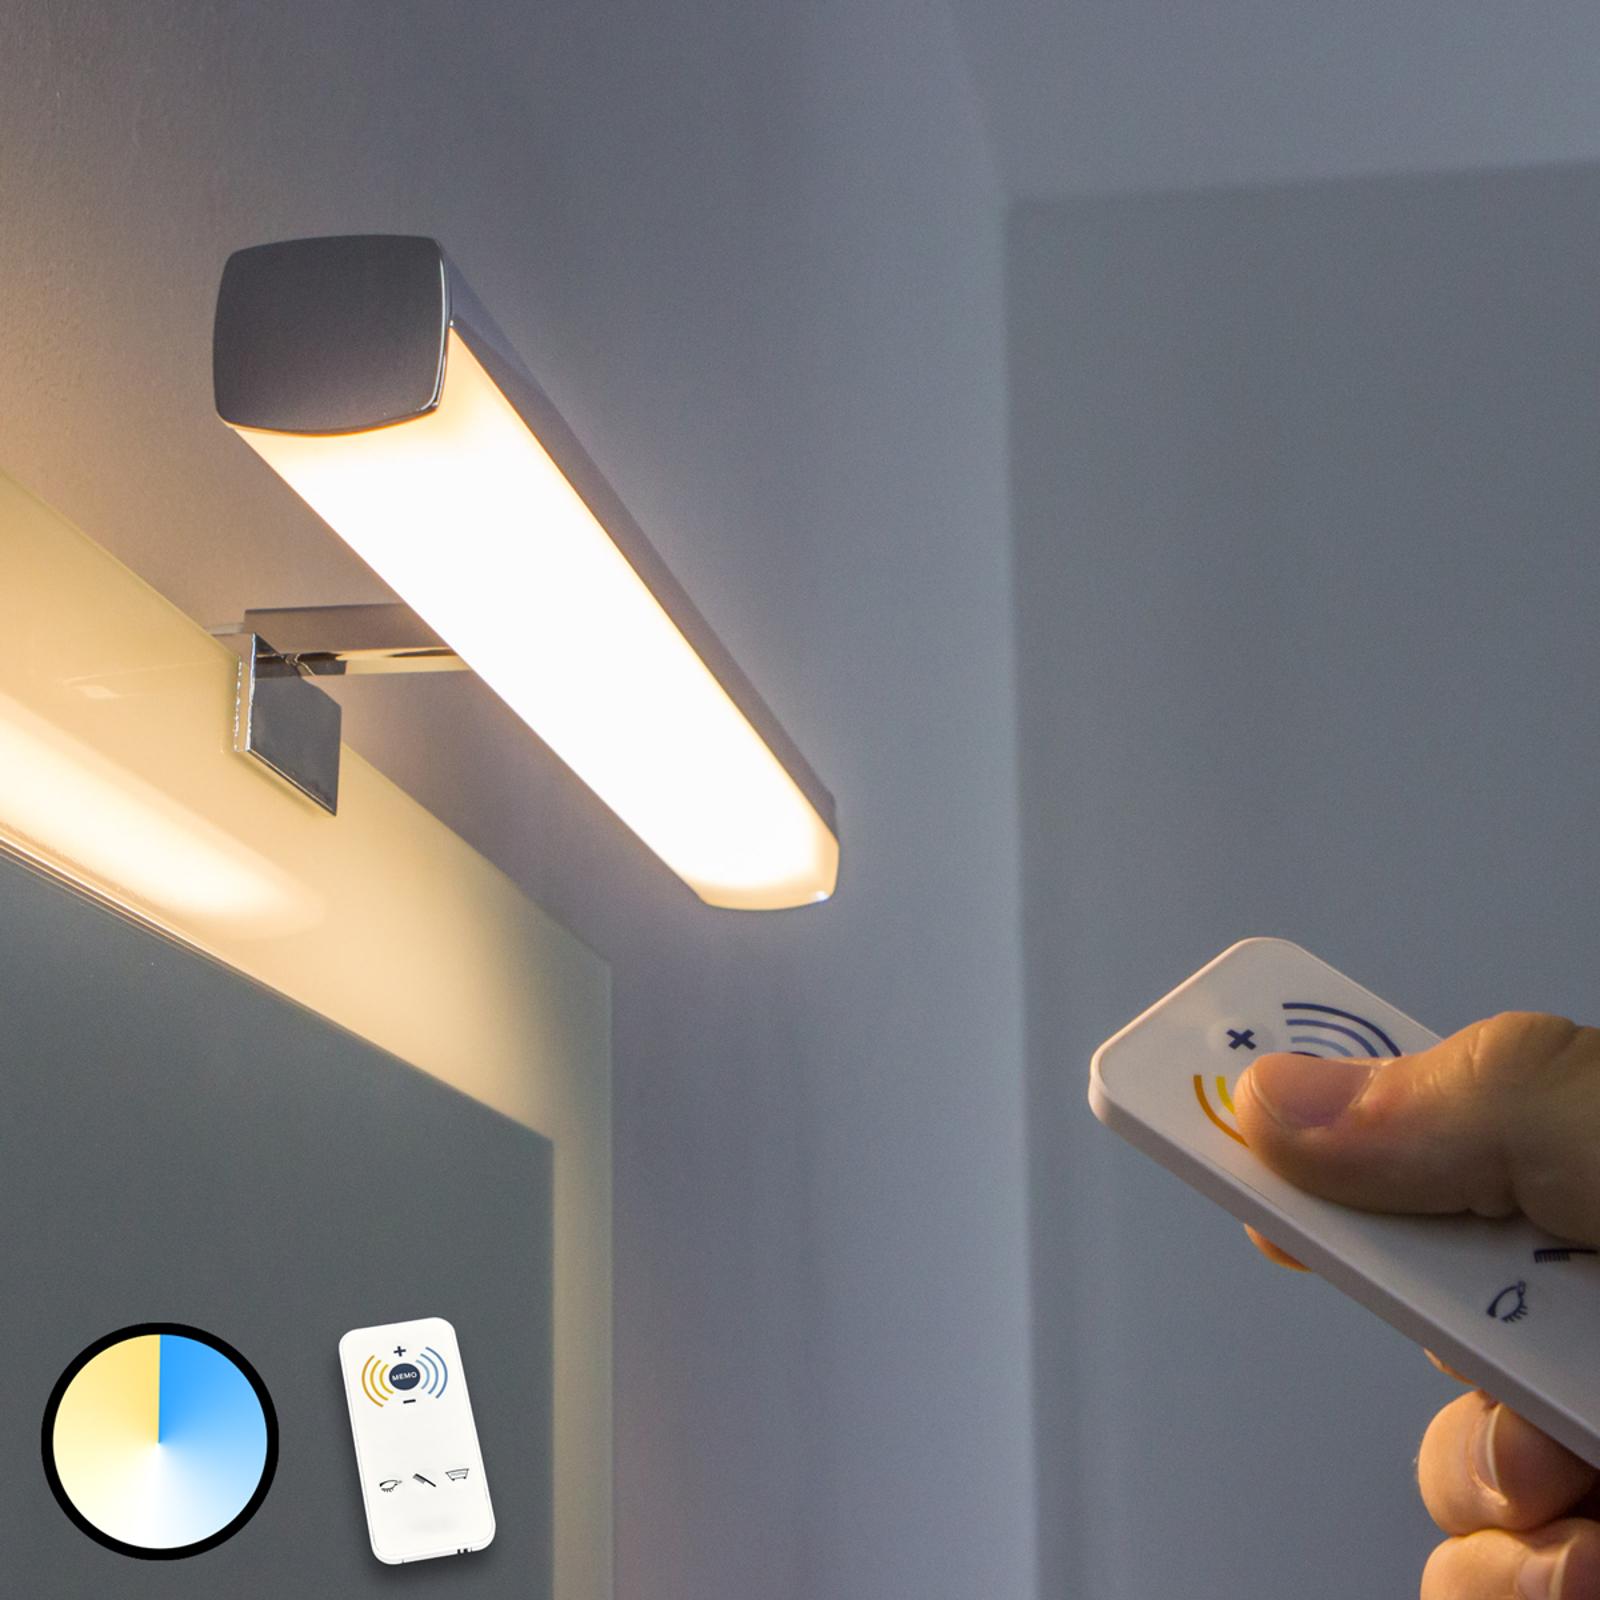 LED-speillampe Atlas - lysfarge kan reguleres